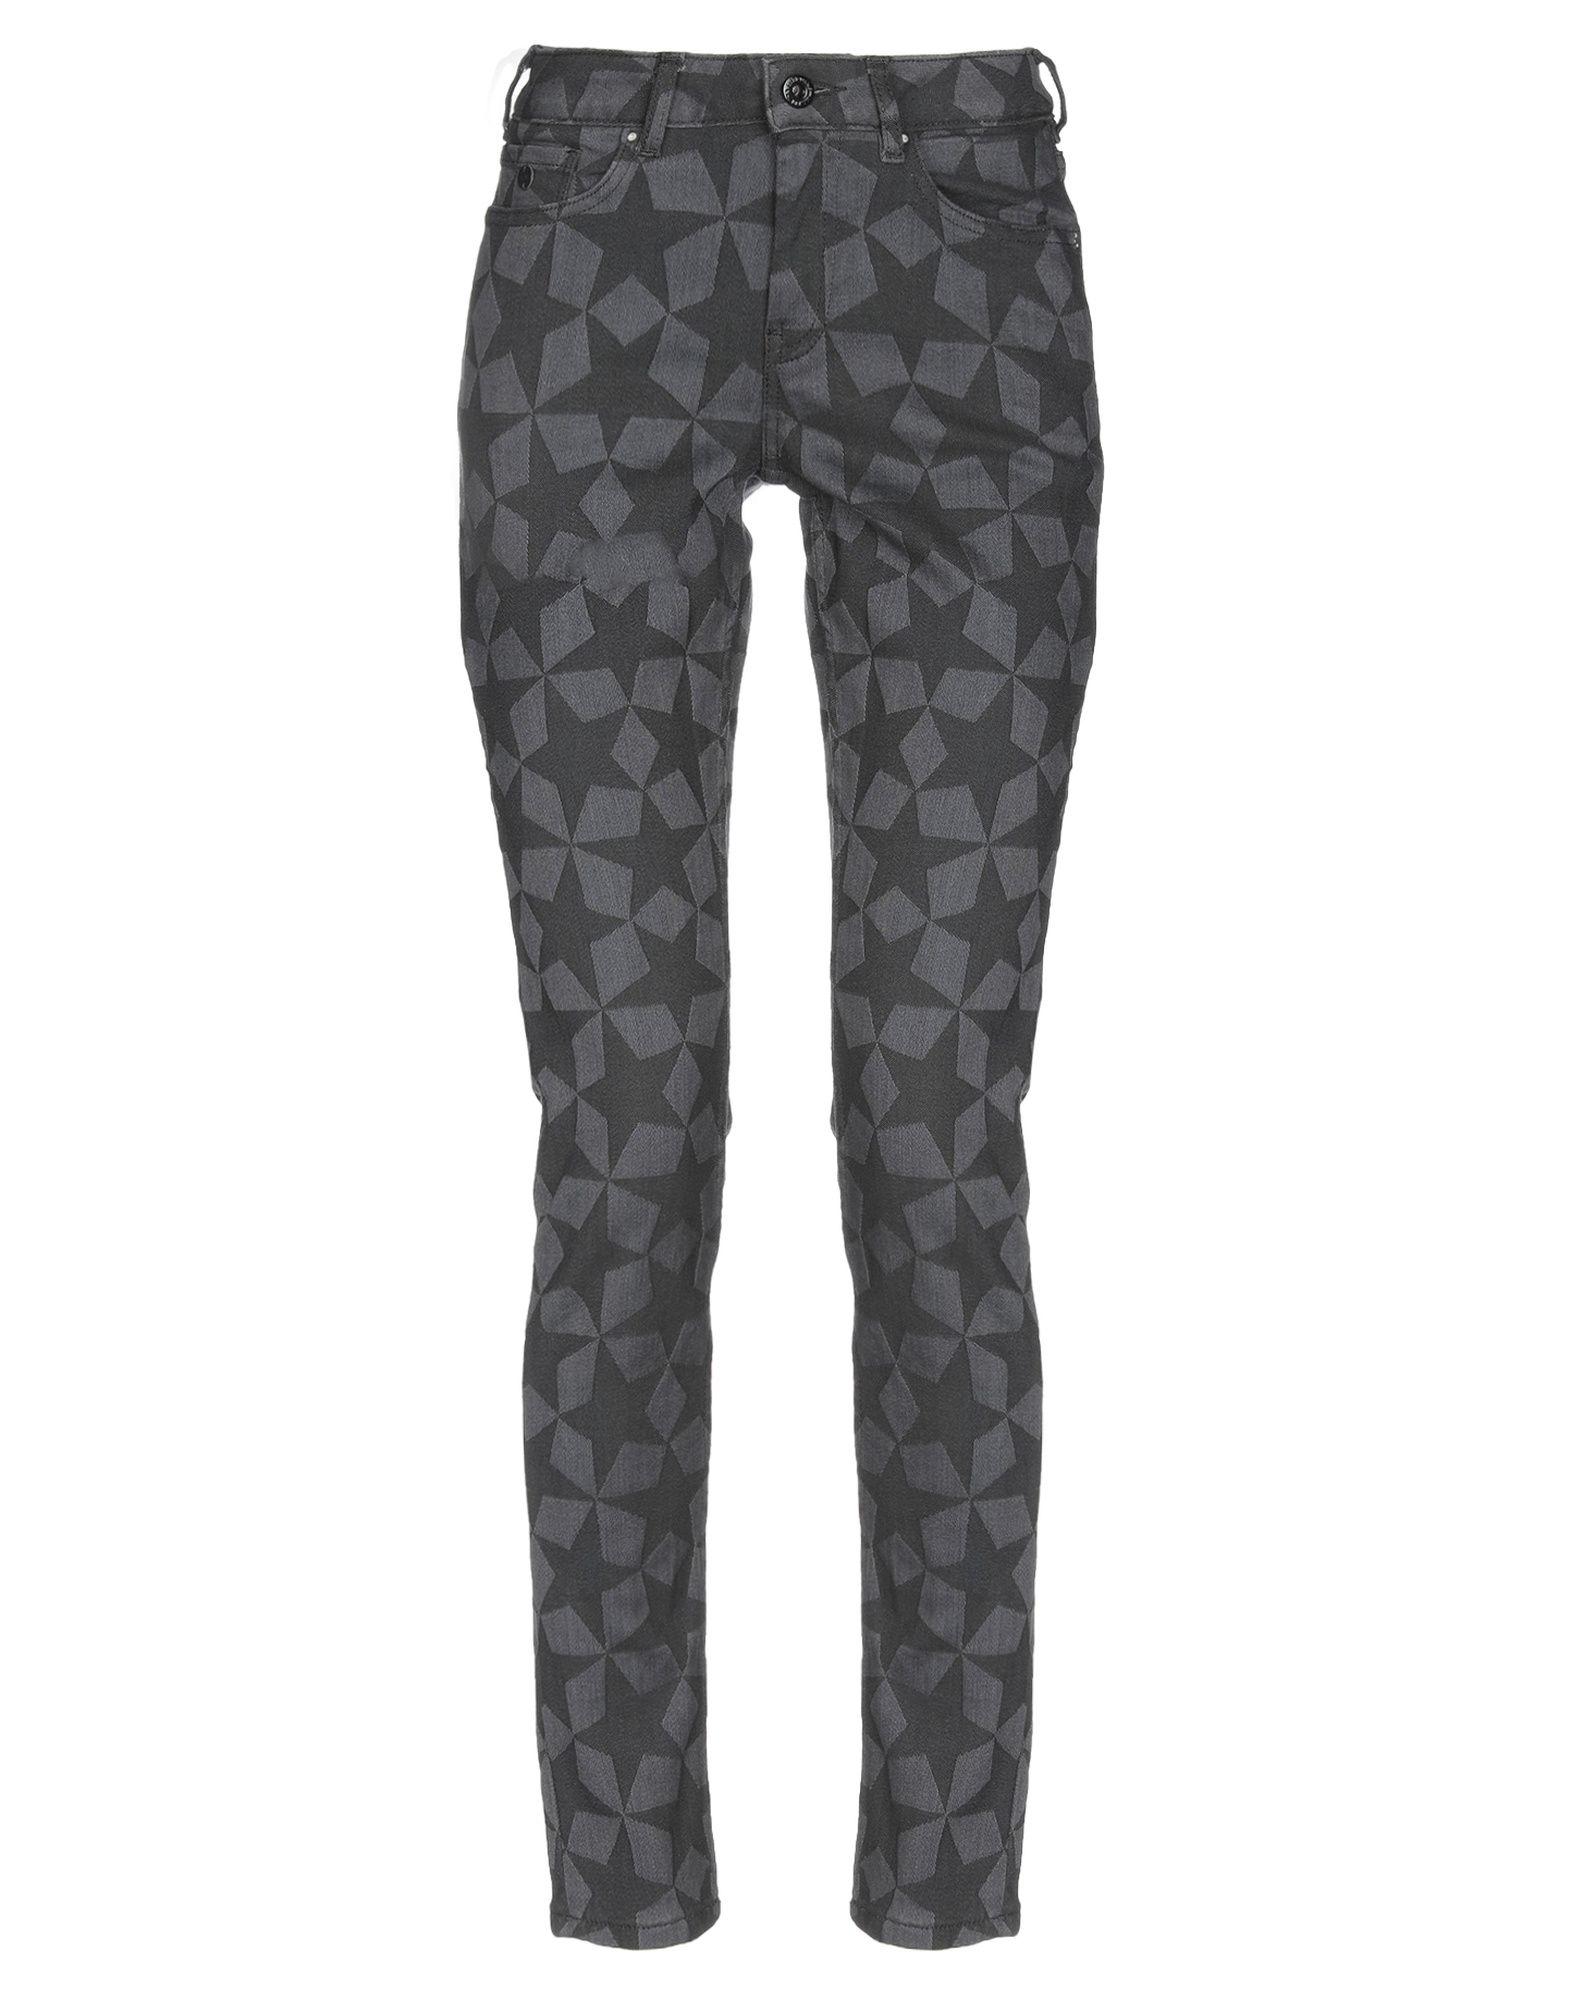 Pantaloni Jeans Scotch & & Soda donna - 13295246KC  mit günstigen Preis Top-Marke zu bekommen